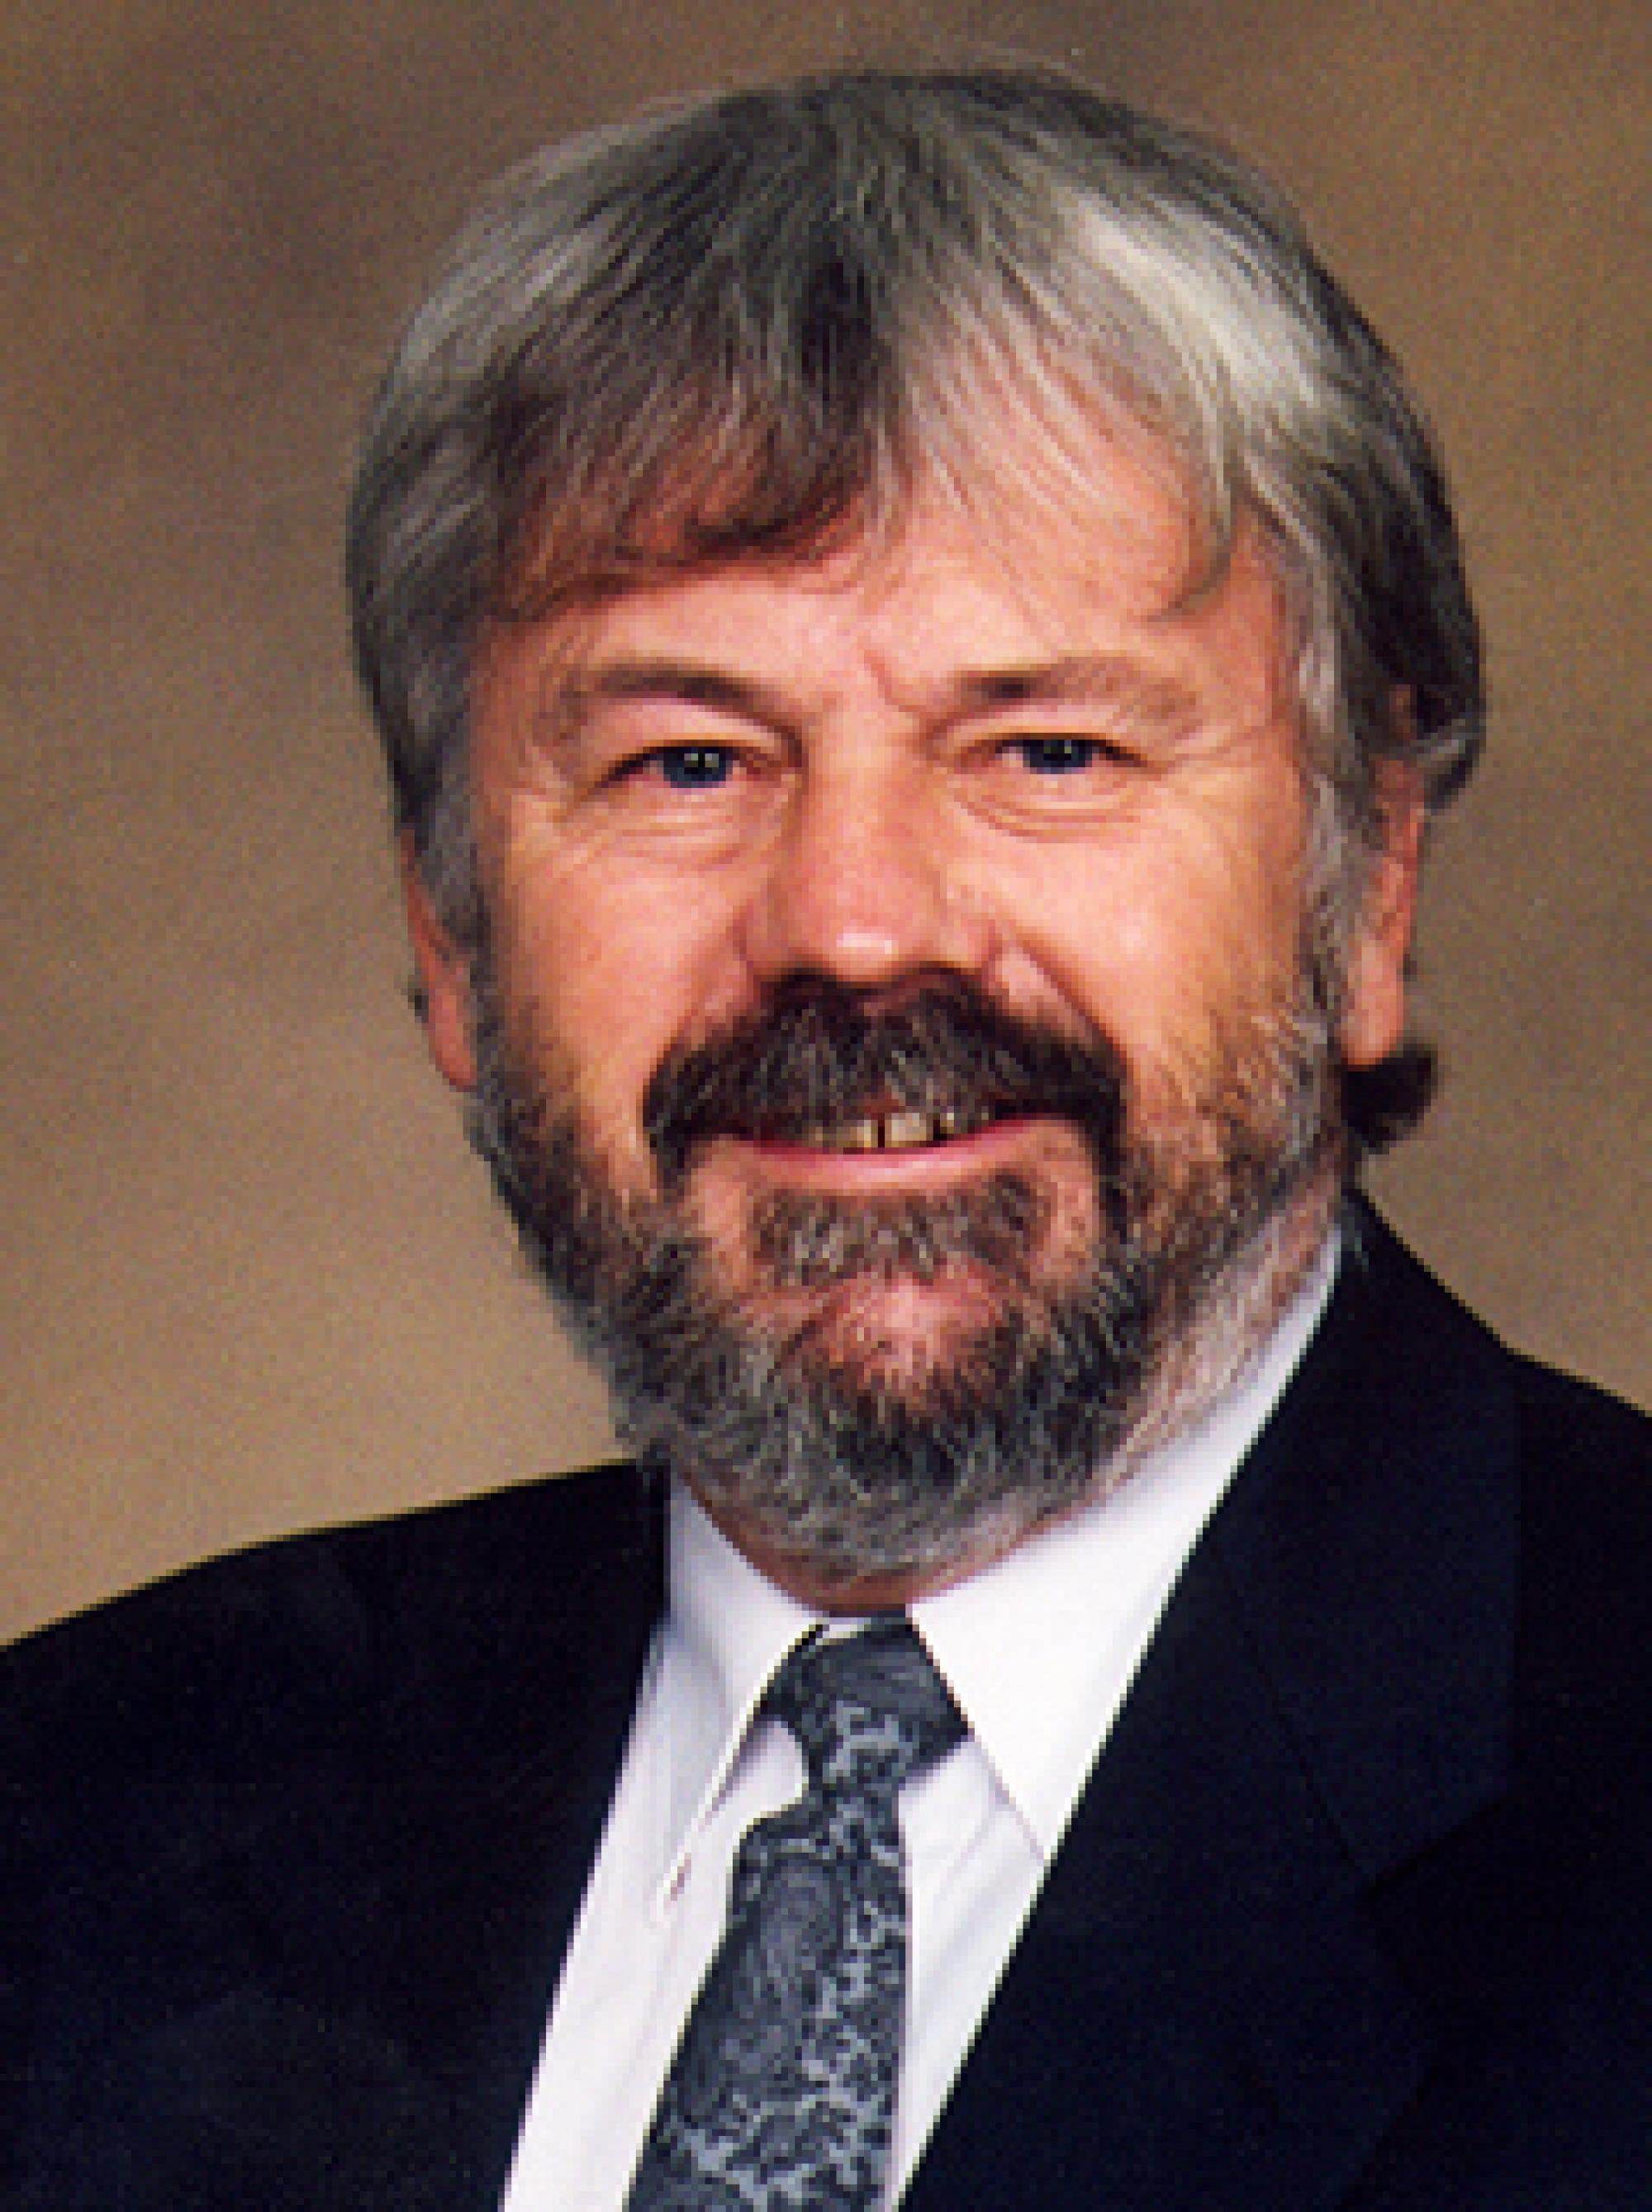 Jim Shuttleworth